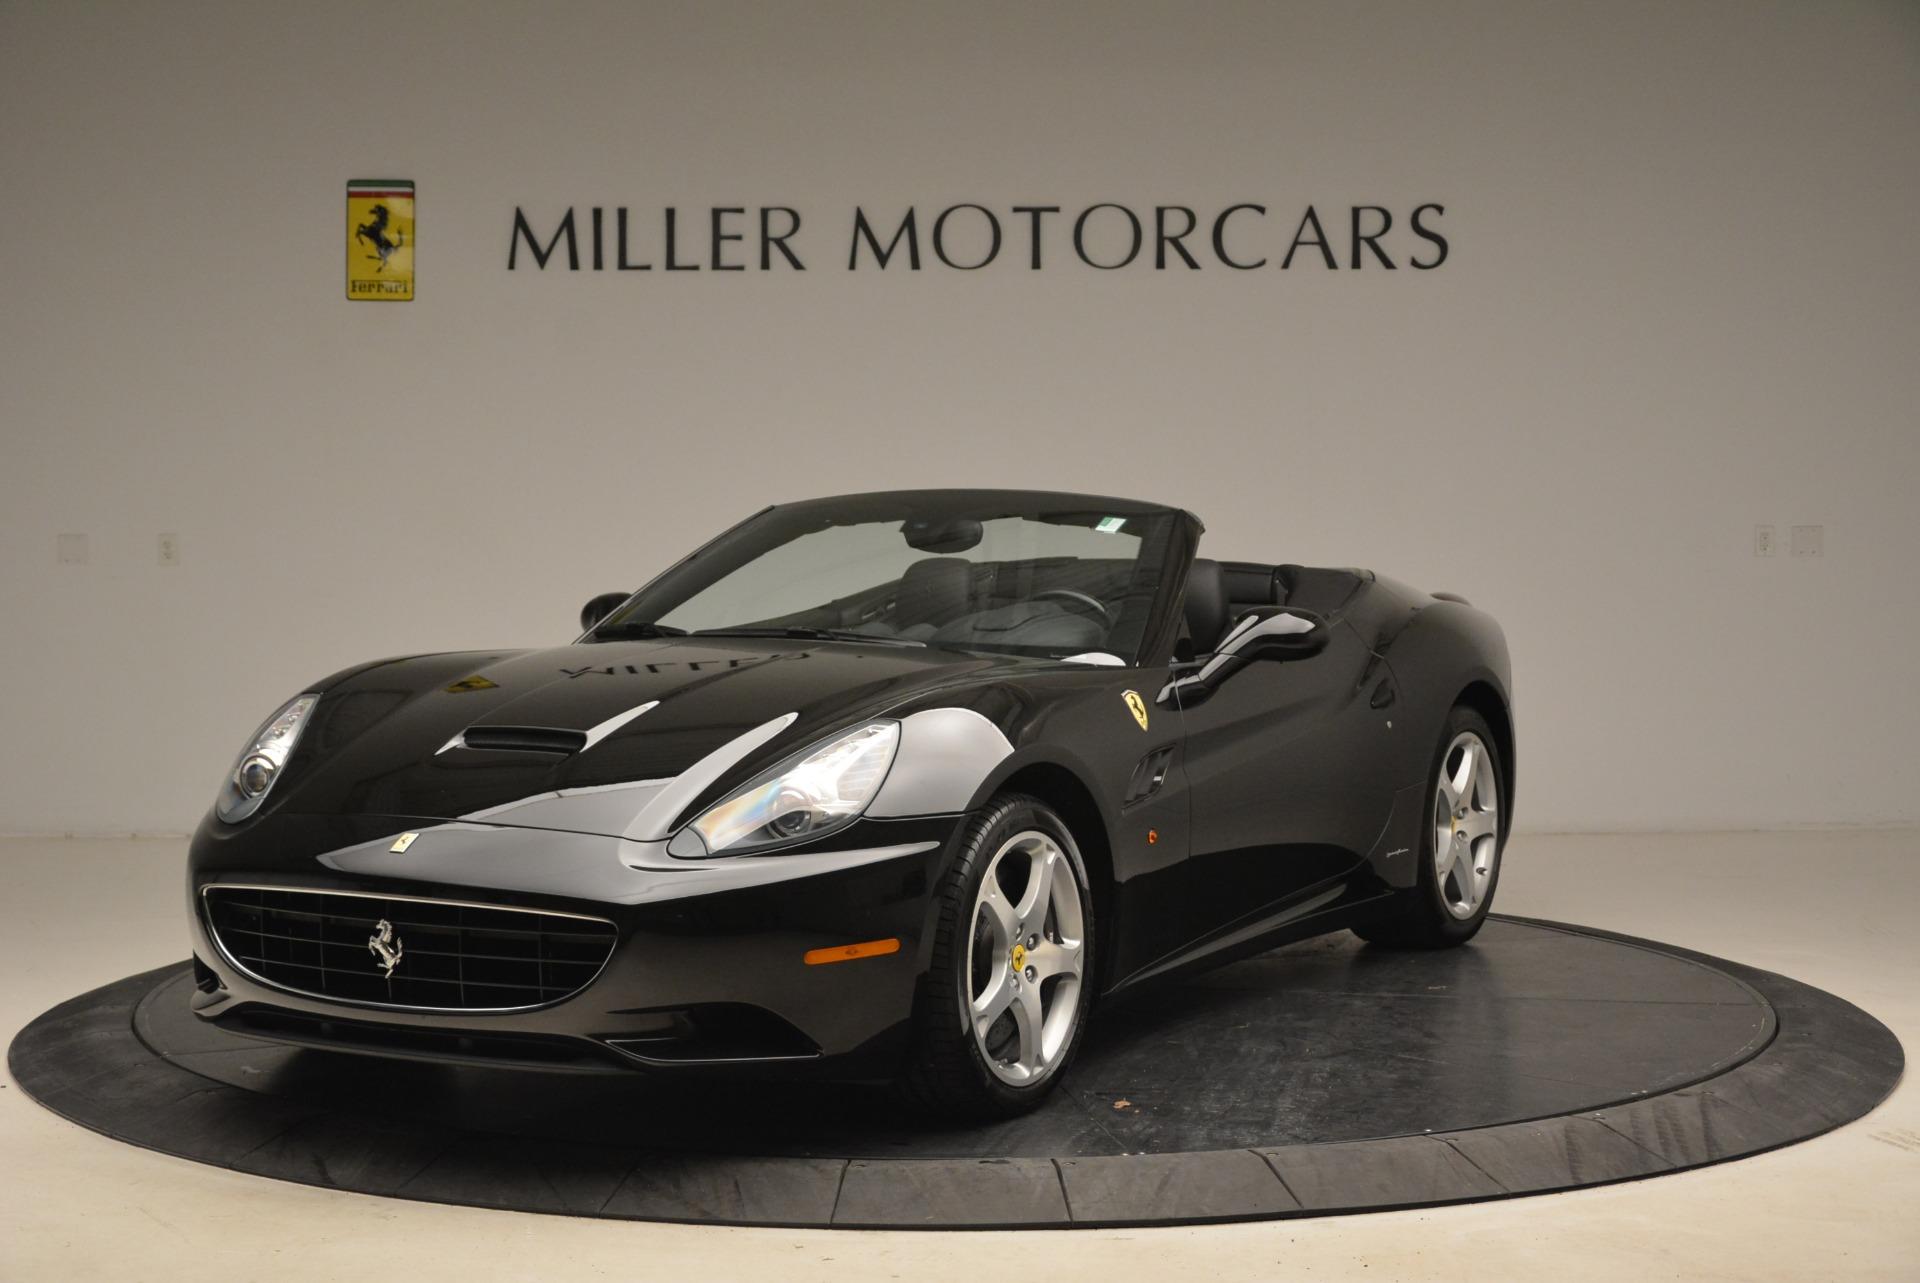 Used 2009 Ferrari California for sale Sold at McLaren Greenwich in Greenwich CT 06830 1